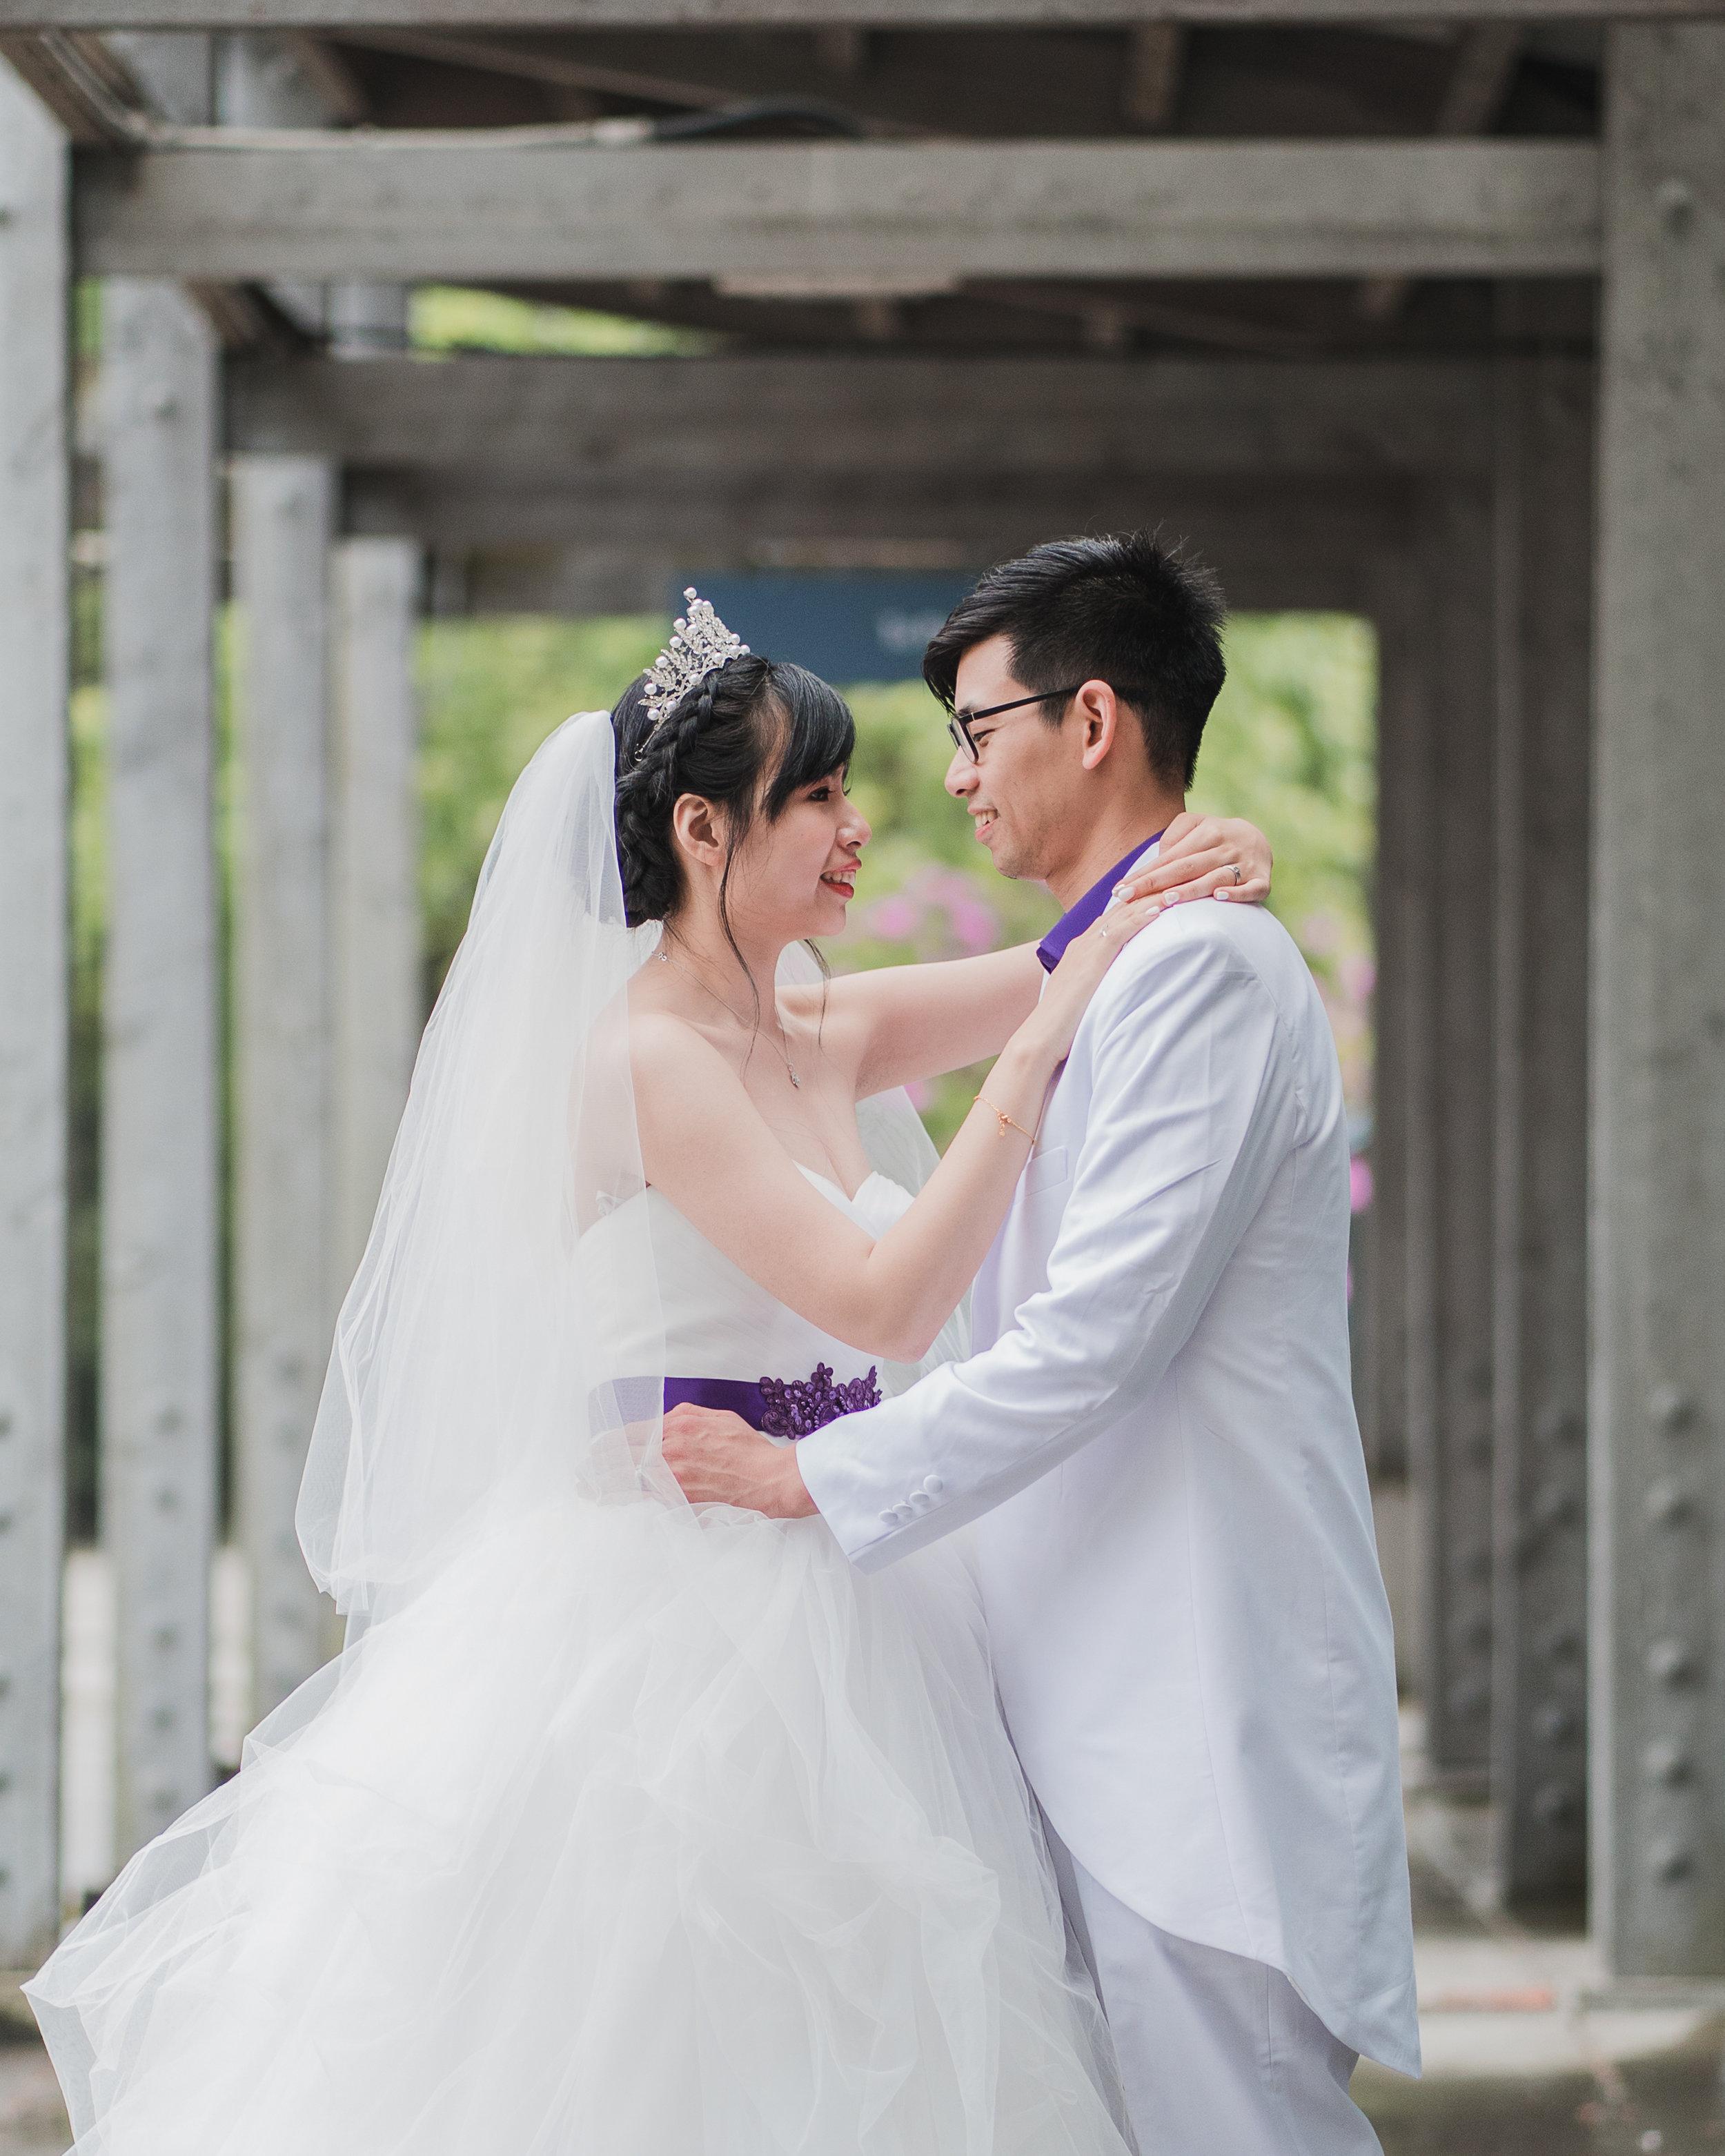 20190520 - Pamela & Matthew Wedding - 0224.jpg